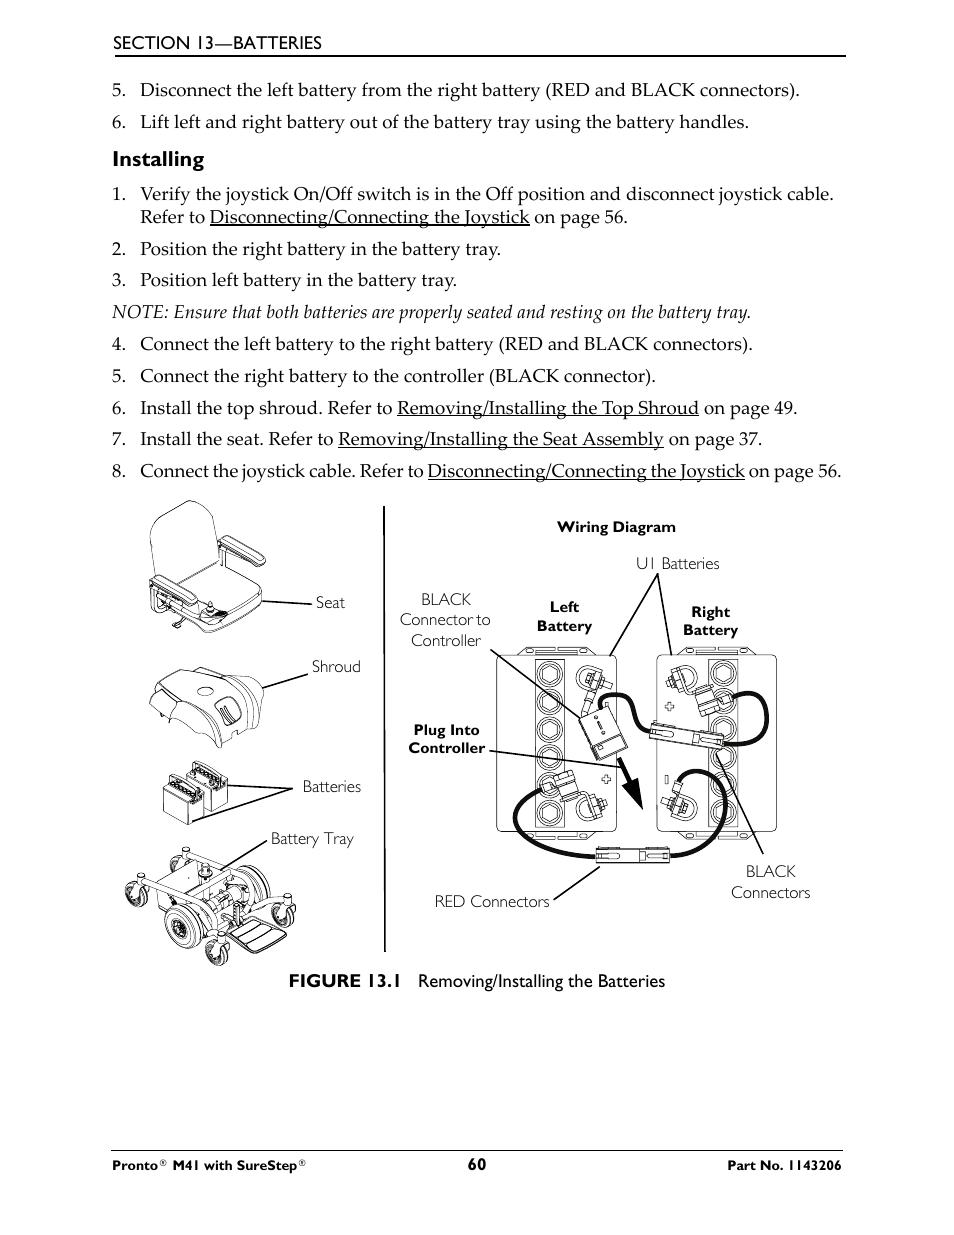 [DVZP_7254]   Invacare Wiring Diagram | Wiring Diagram | Invacare Wiring Diagram |  | Wiring Diagram - Autoscout24